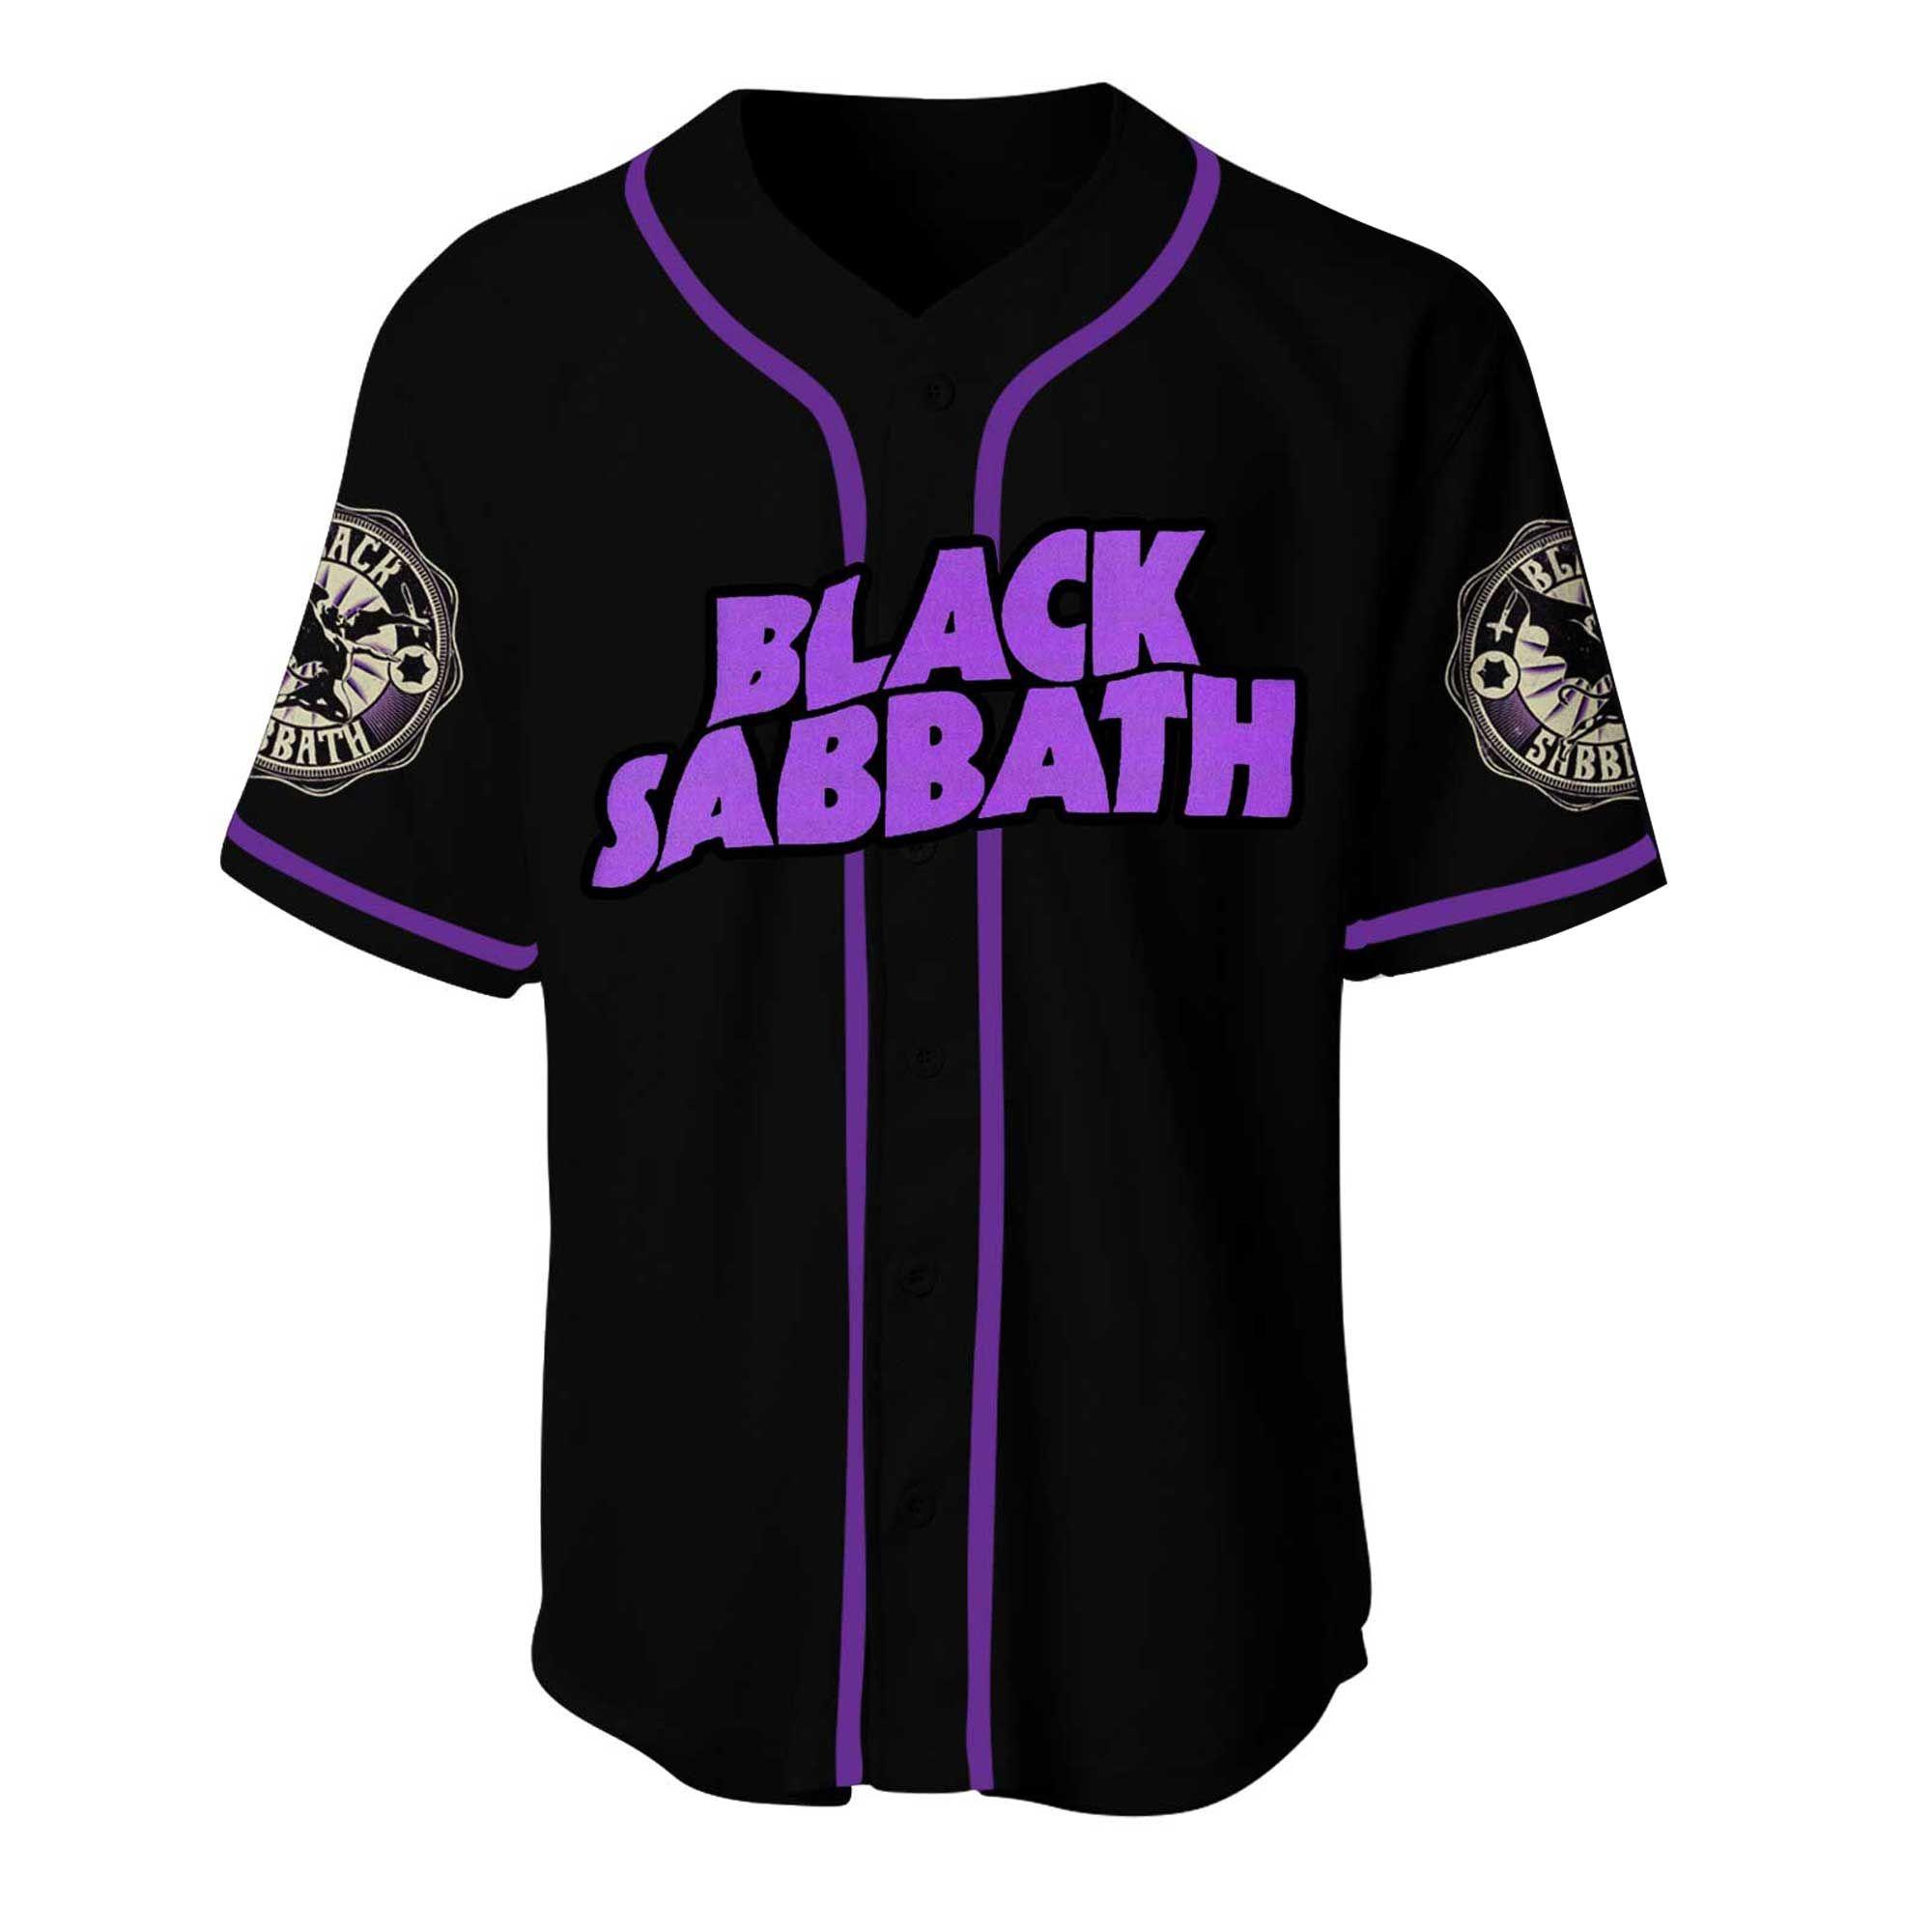 Black Sabbath Baseball Jersey Shirt